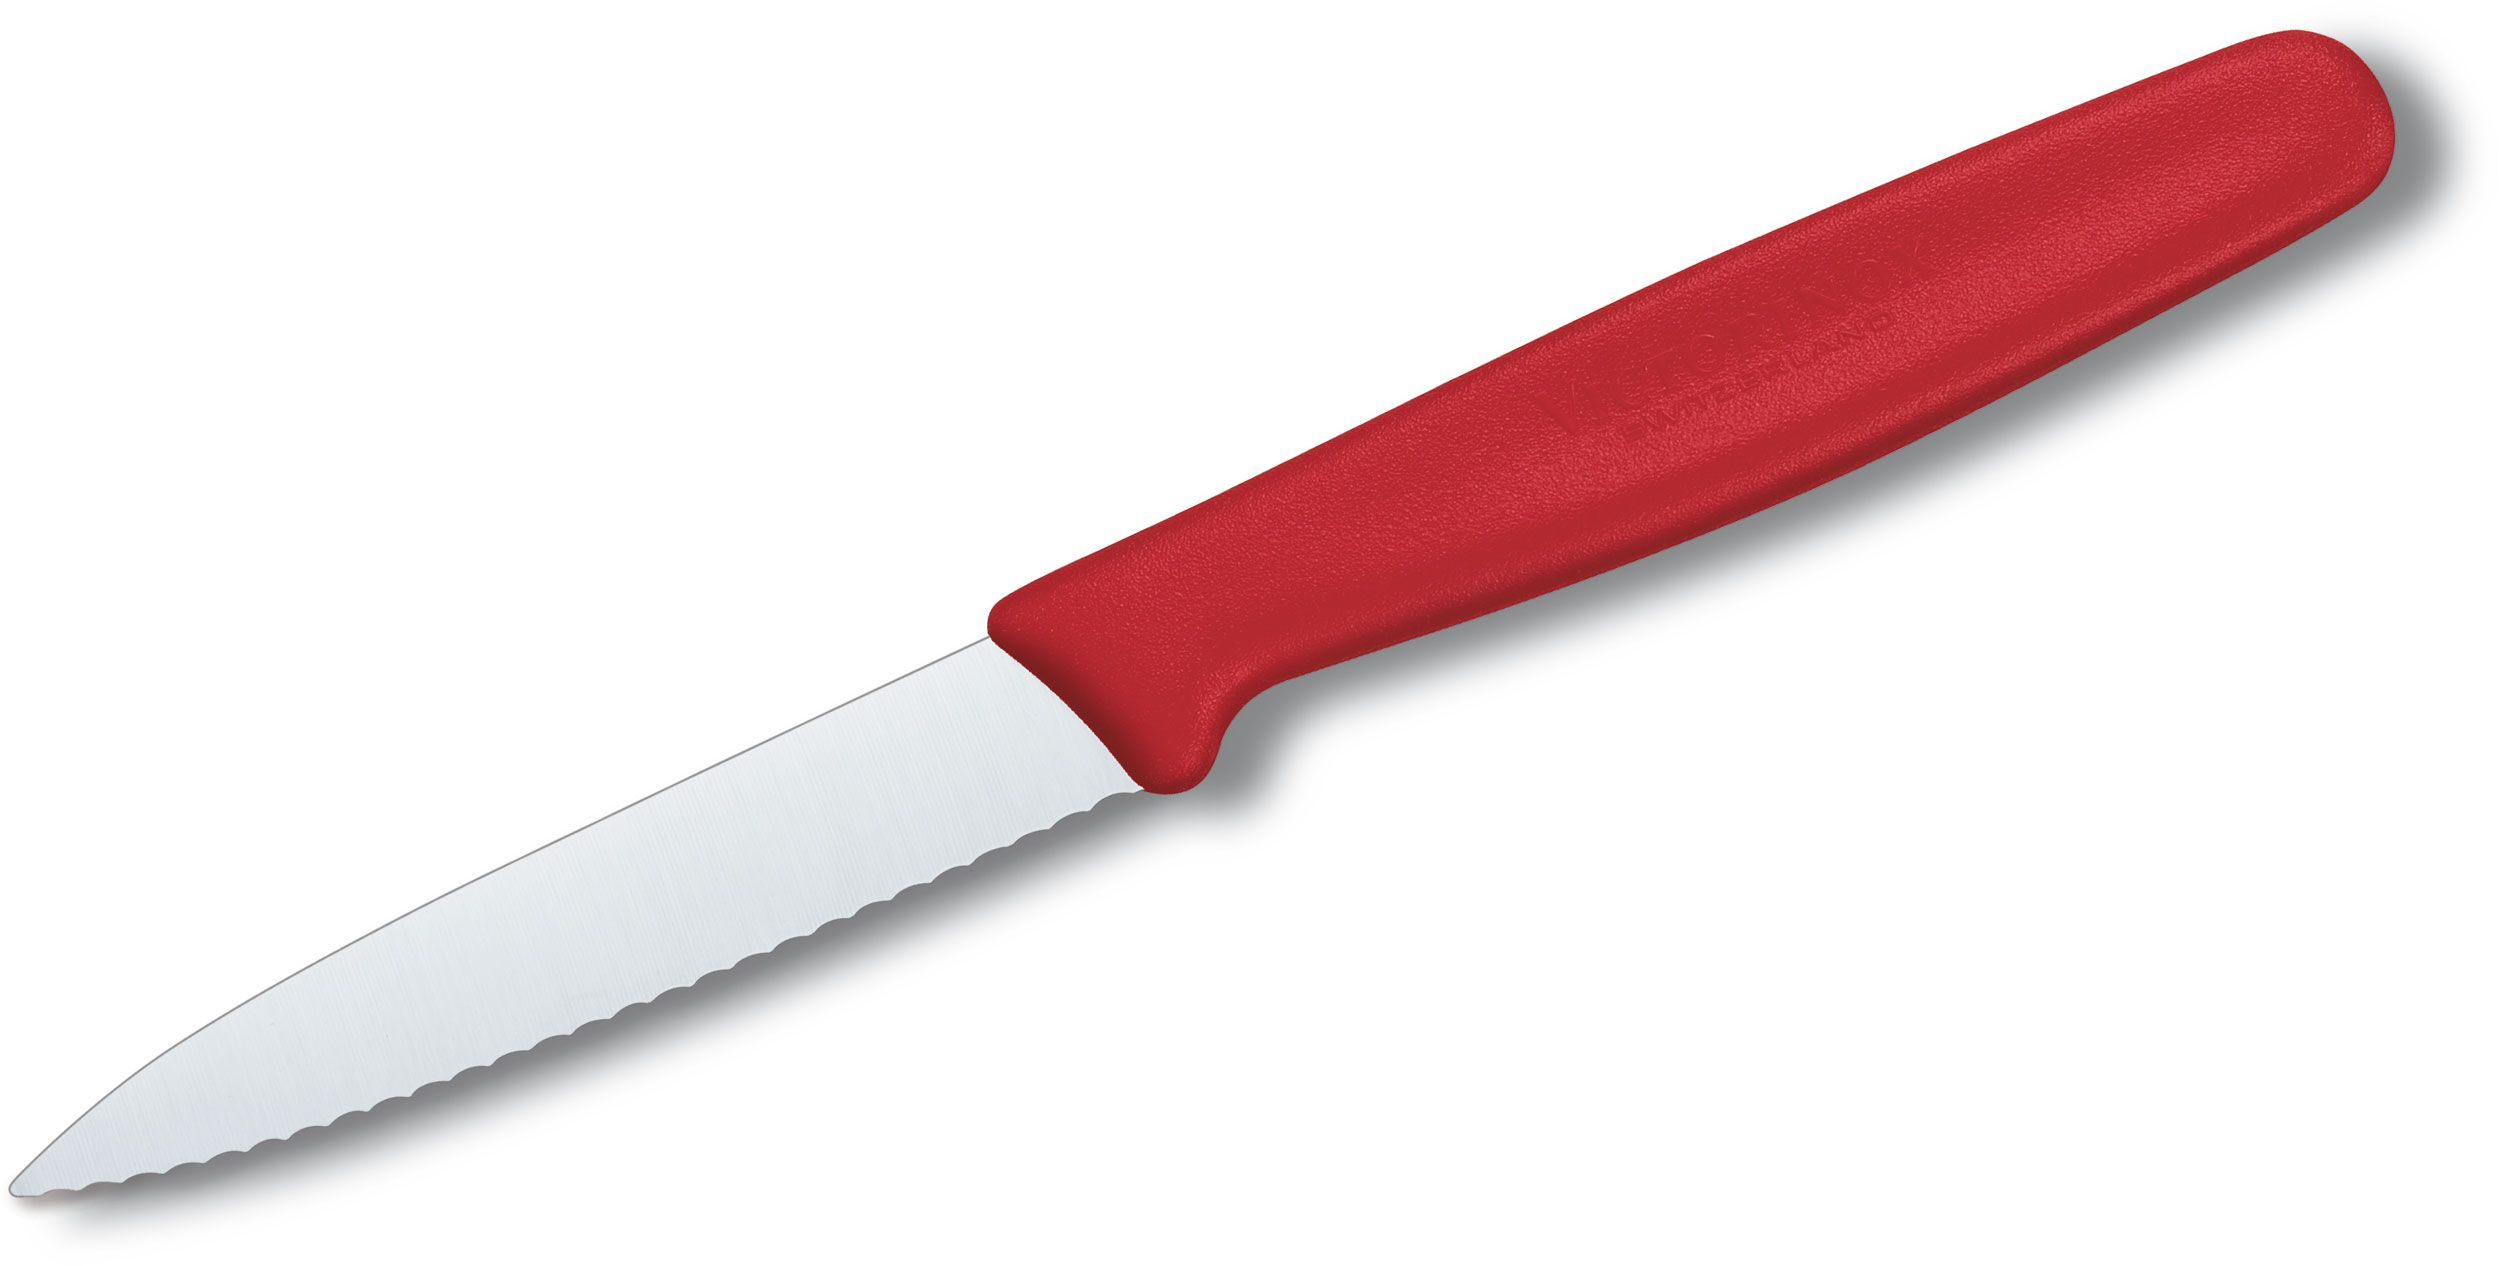 Victorinox Forschner Standard 3.25 inch Serrated Paring Knife, Red Polypropylene Handle